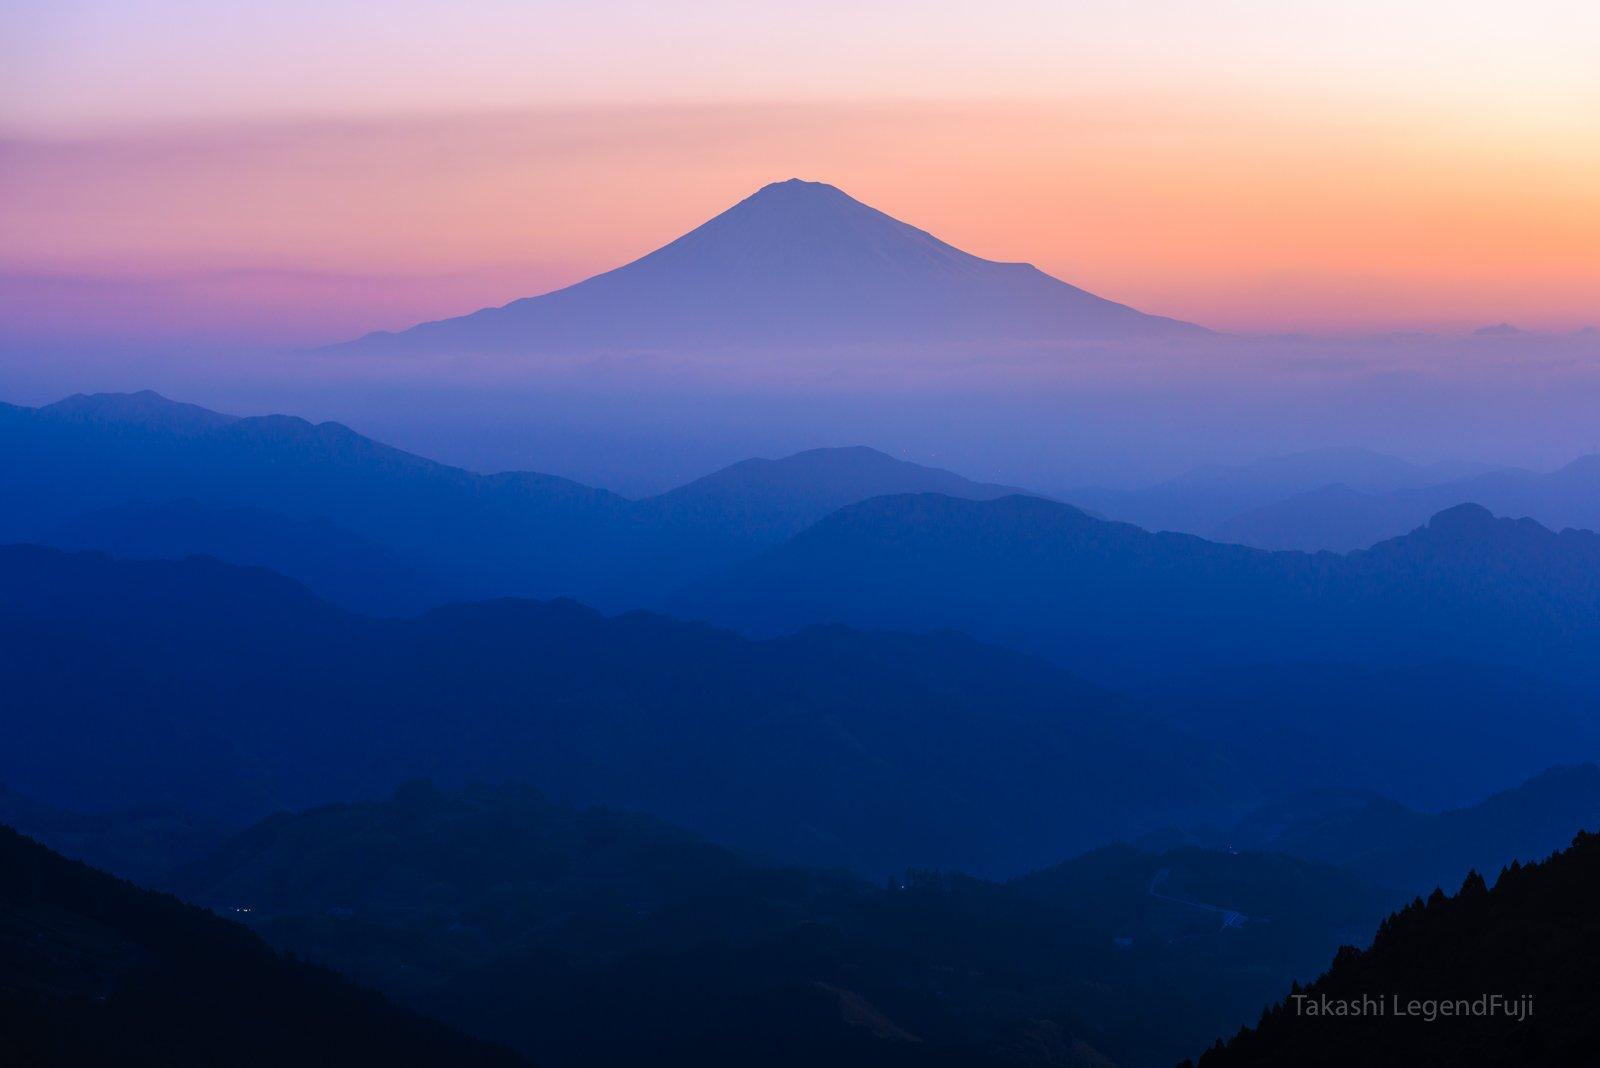 fuji,mountain,sky,haze,pink,morning glow,blue,, Takashi